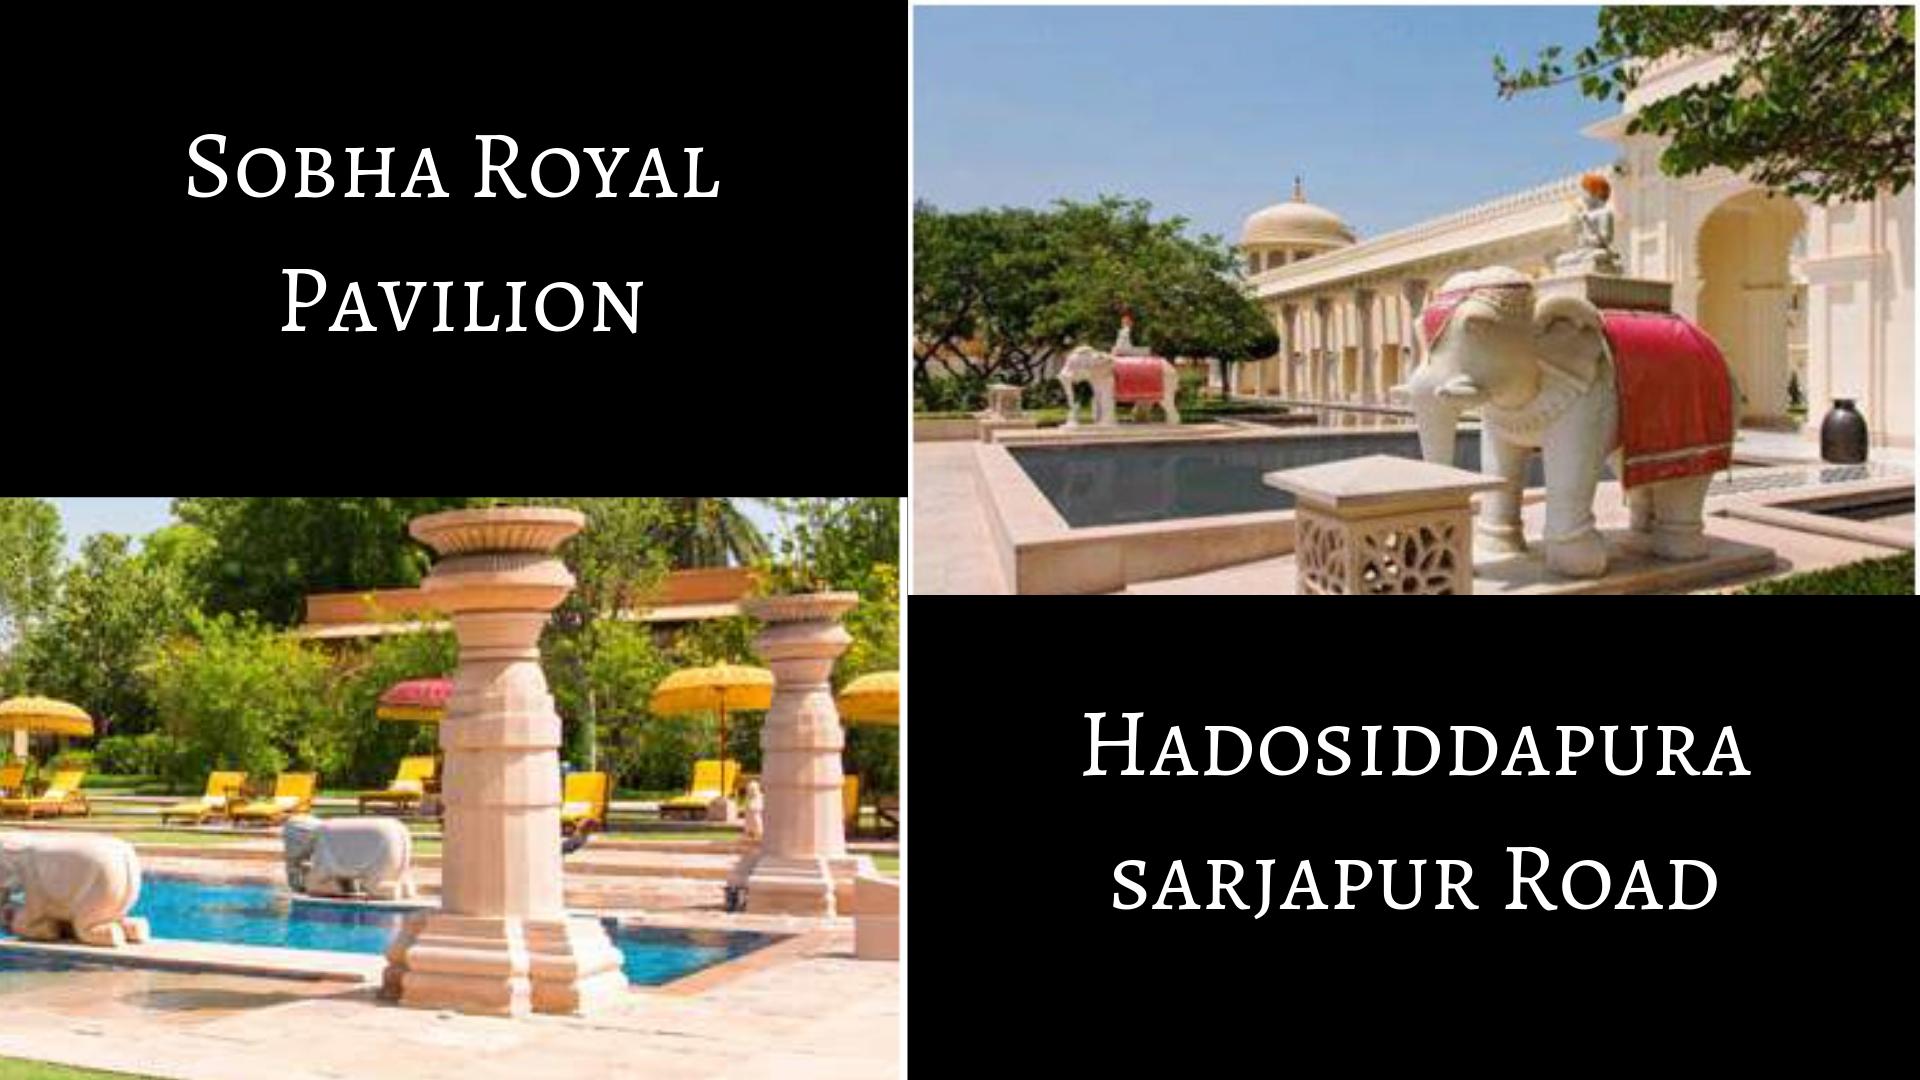 Sobha Royal Pavilion, Sobha Royal Pavilion Sarjapur Road, Sobha Royal Pavilion Hadosiddapura